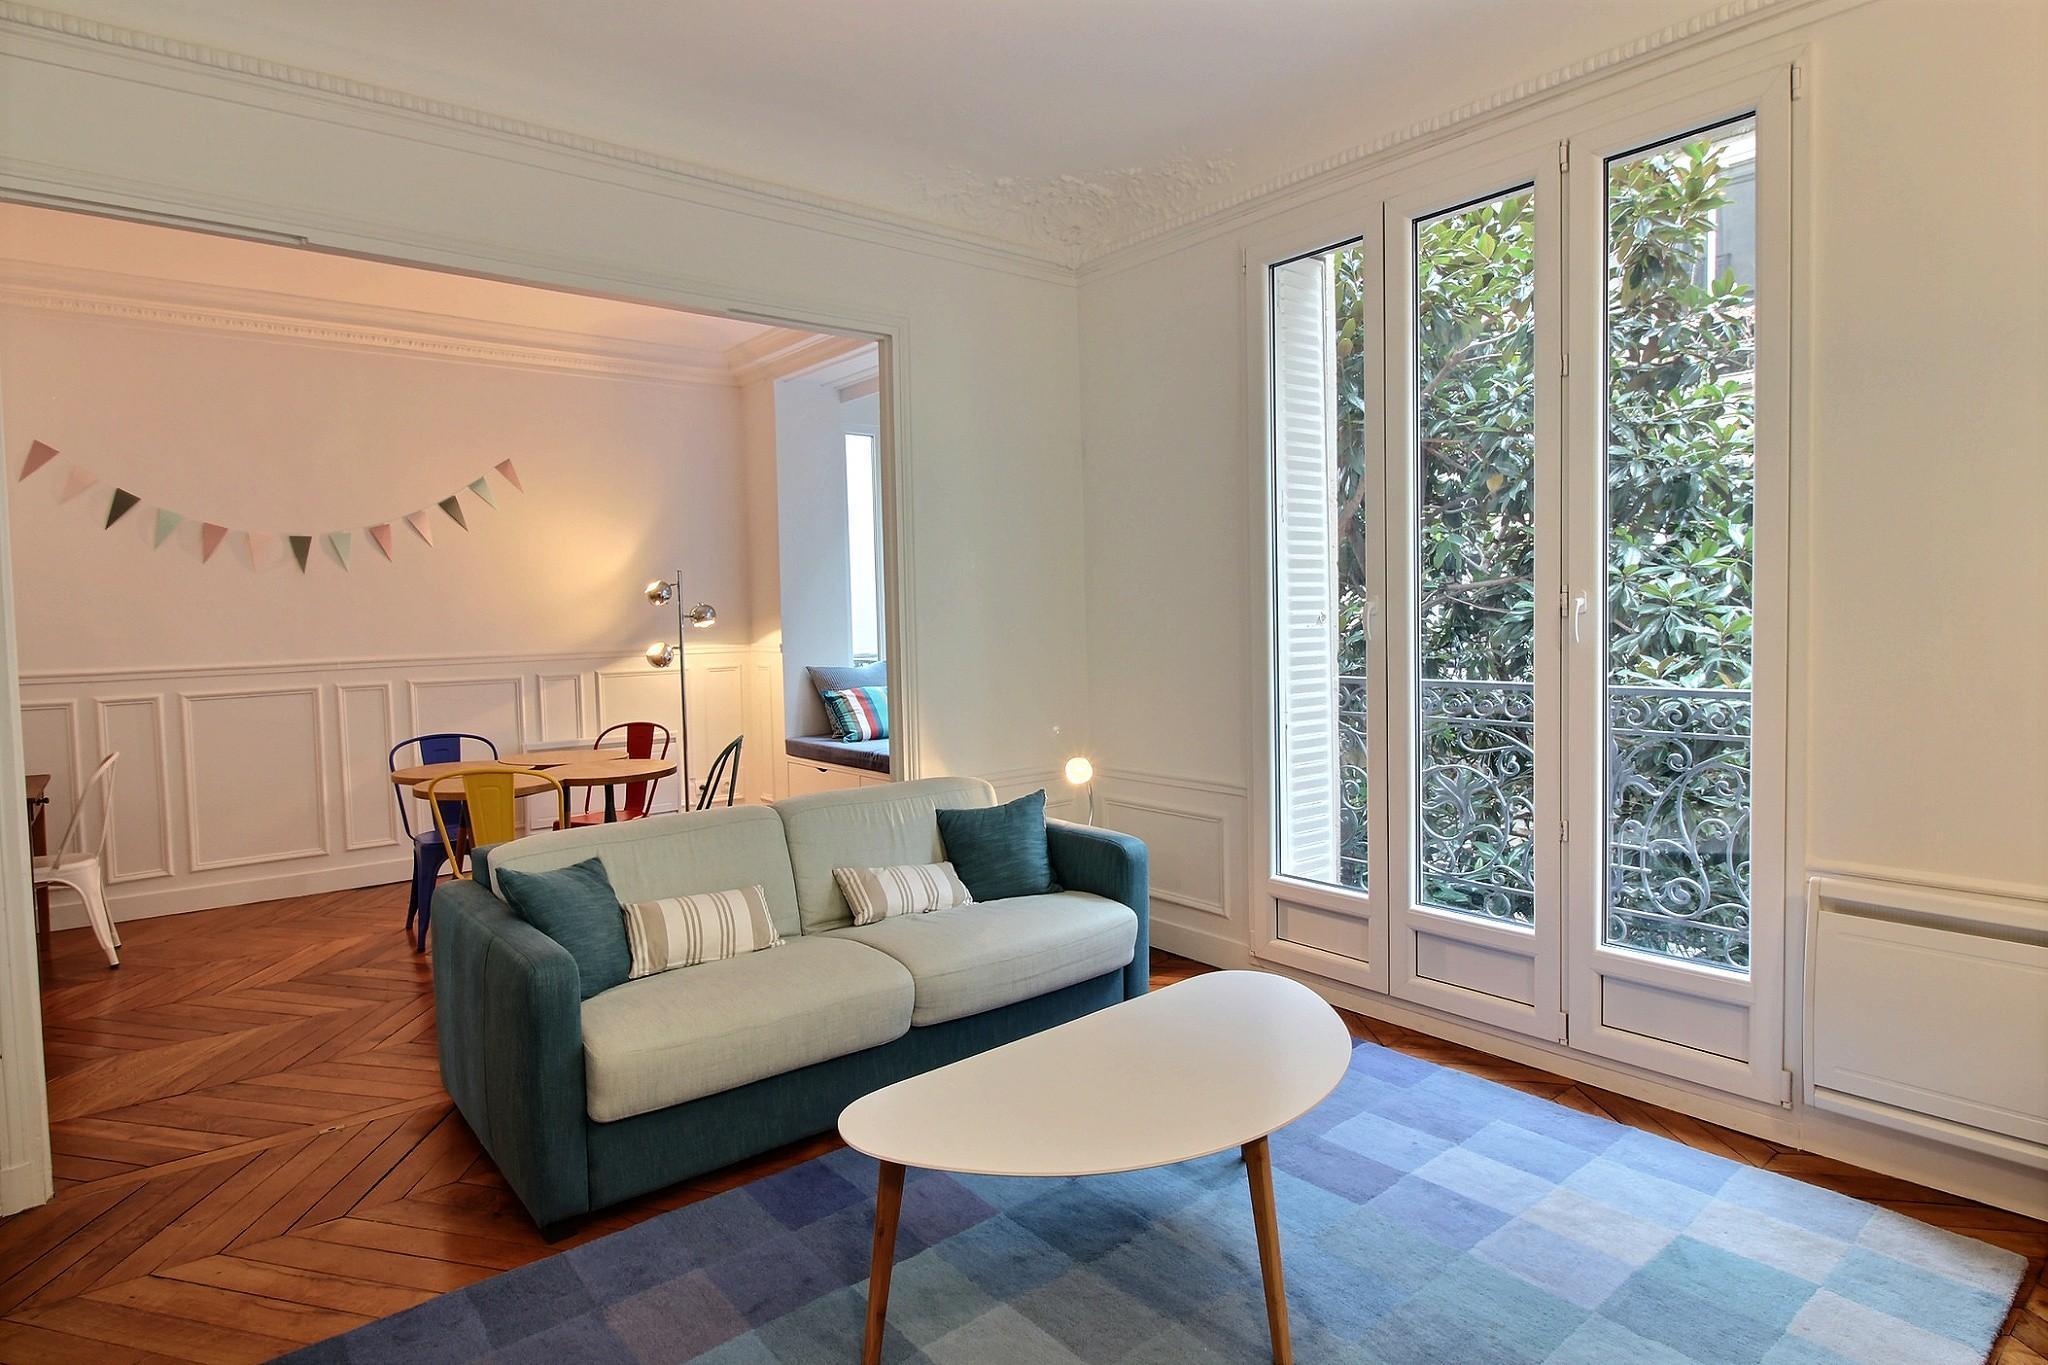 118099 - One bedroom near Sacre Coeur